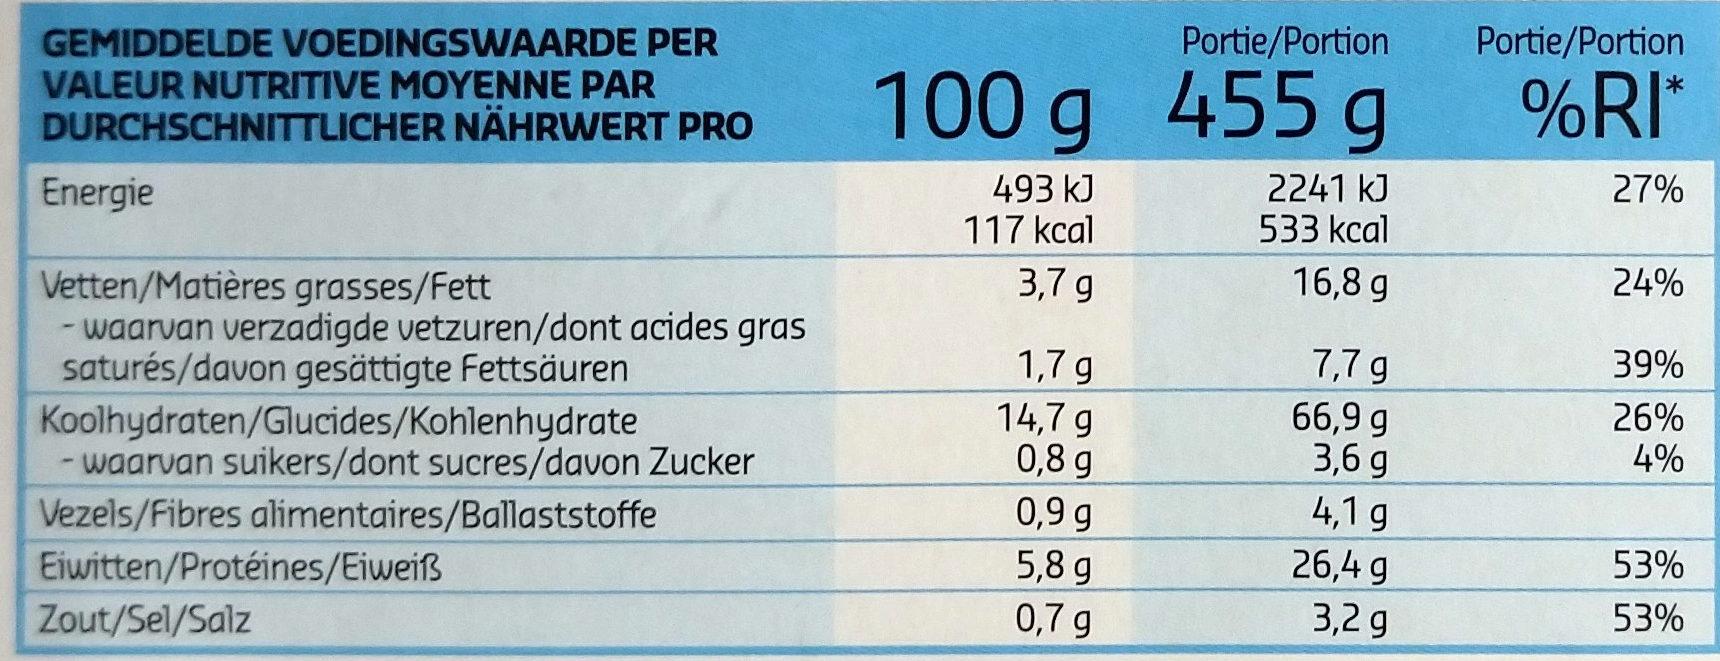 Waterzooi aux scampis - Informations nutritionnelles - fr